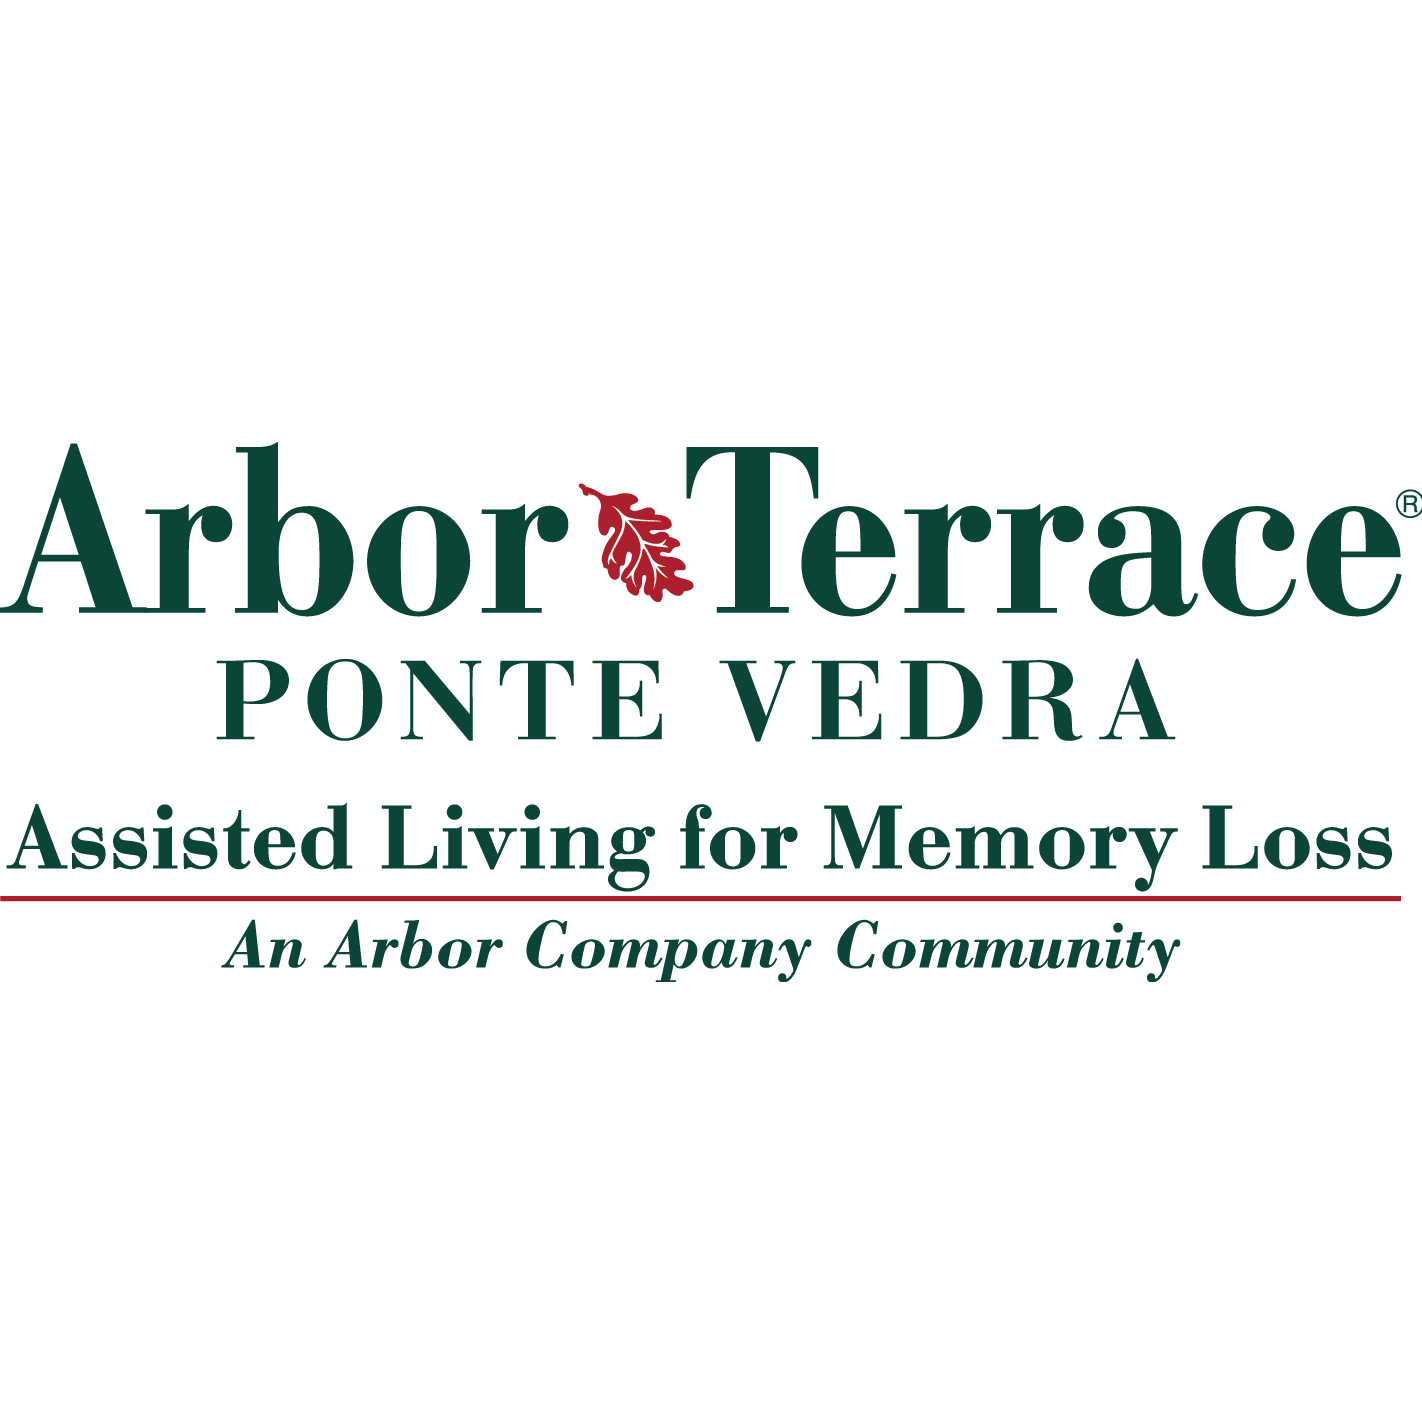 Arbor Terrace Ponte Vedra image 5